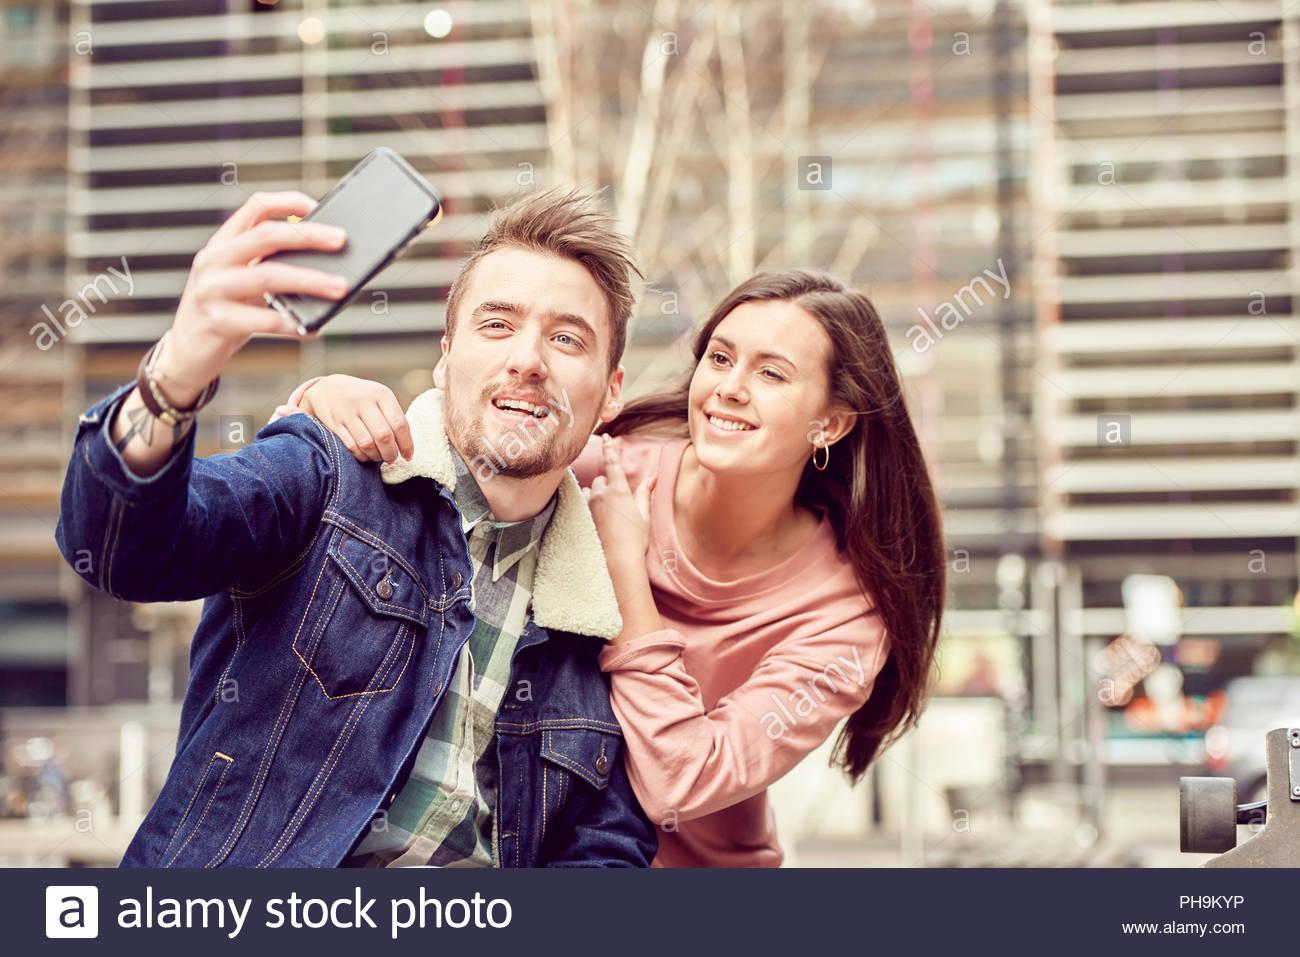 Teenage couple taking selfie together - Stock Image